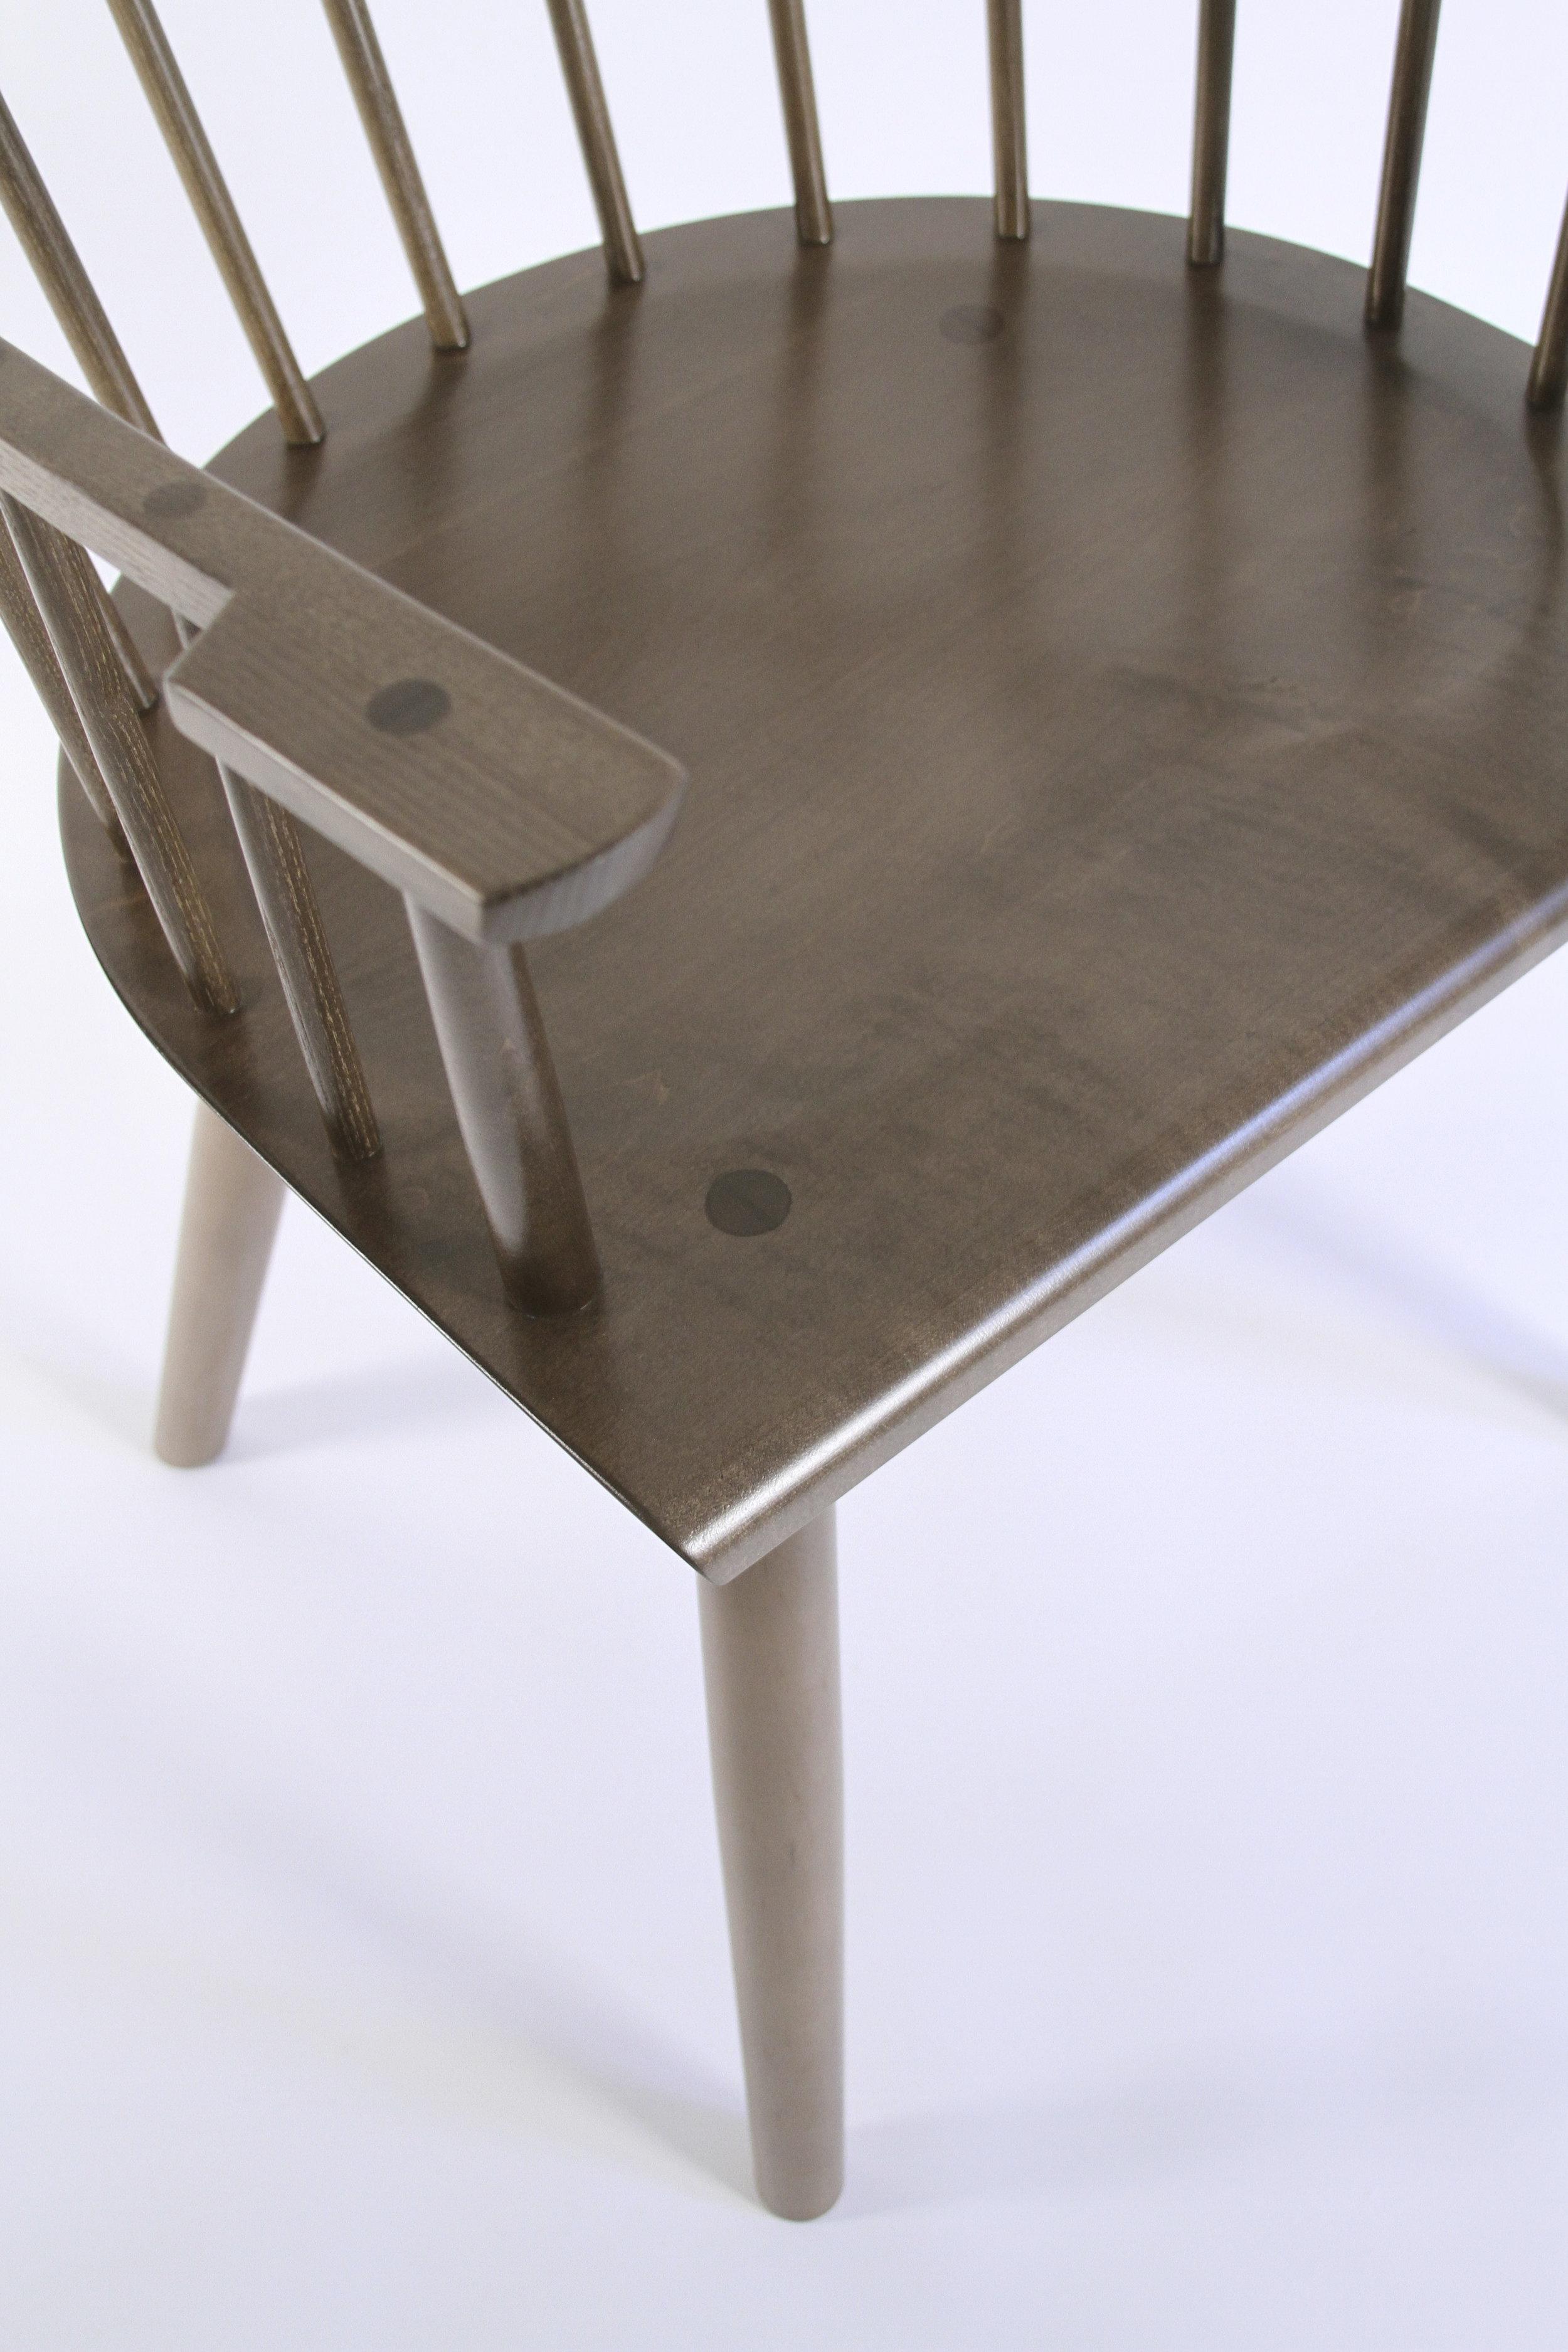 O&G Studio Colt High Back Highback Windsor Contemporary Dining Chair Armchair Large Salt Pond Dark Warm Medium Grey Gray Stain on Maple